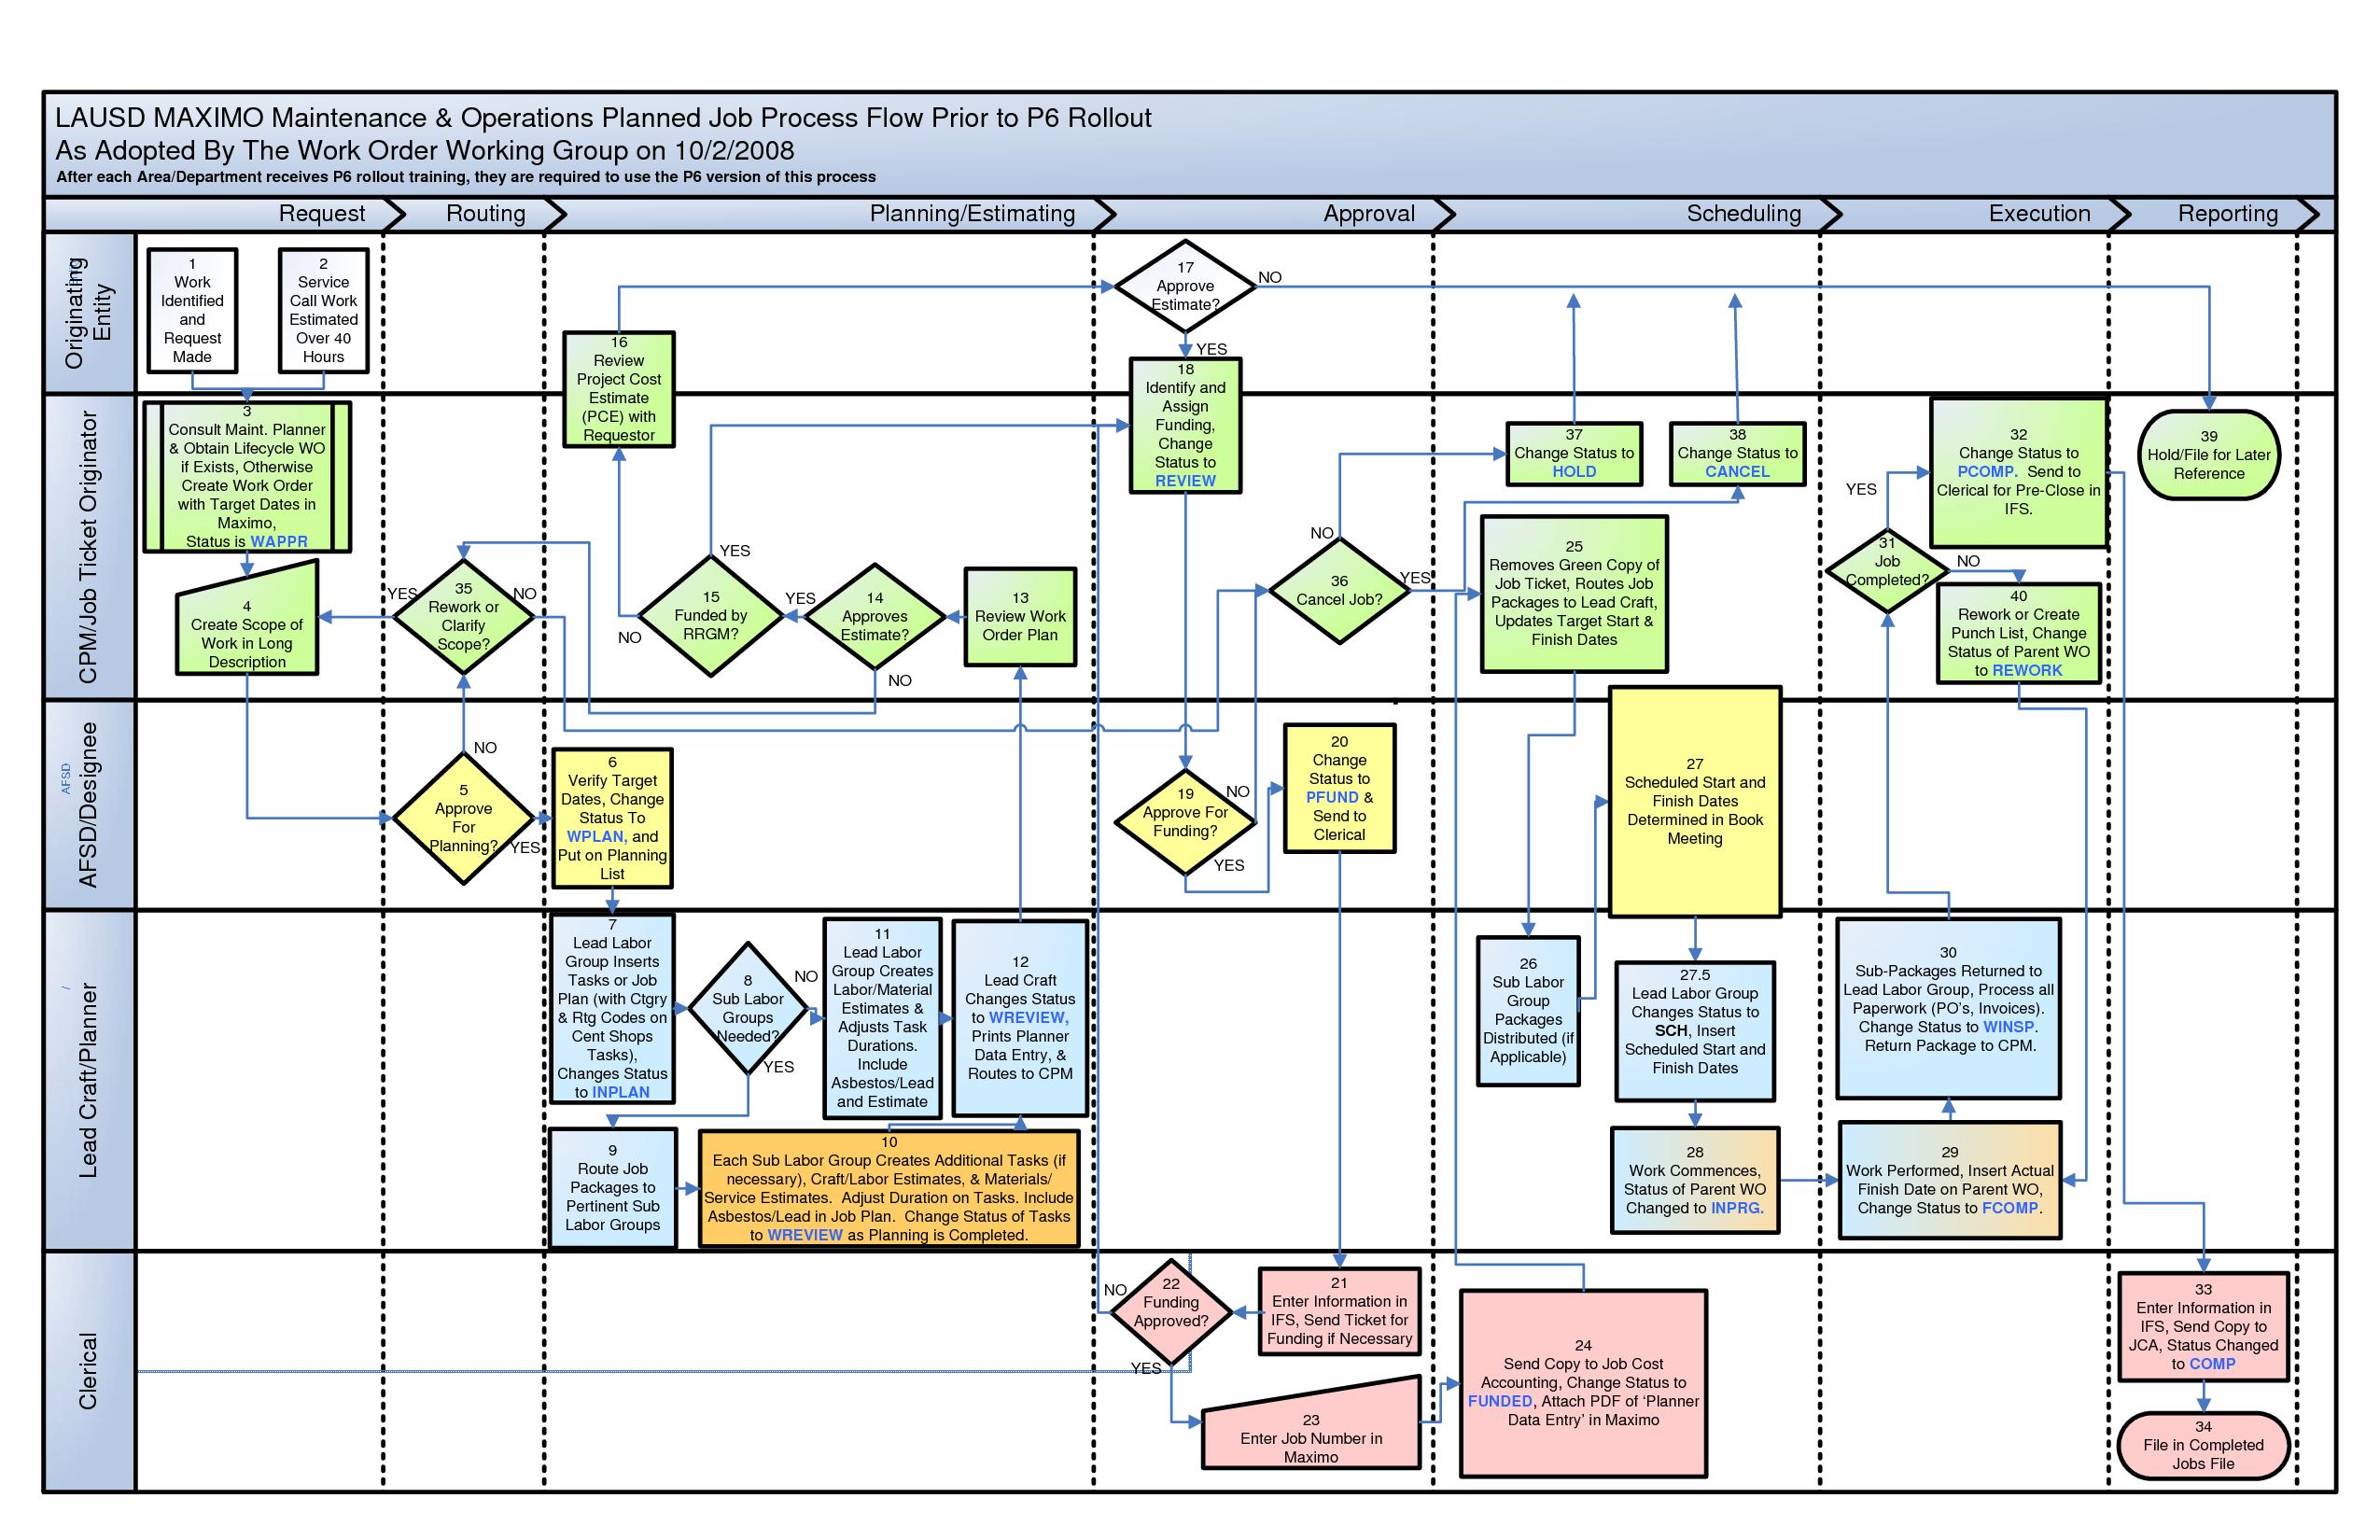 process flow diagram in visio nb 4984  process flow diagram visio download diagram  nb 4984  process flow diagram visio